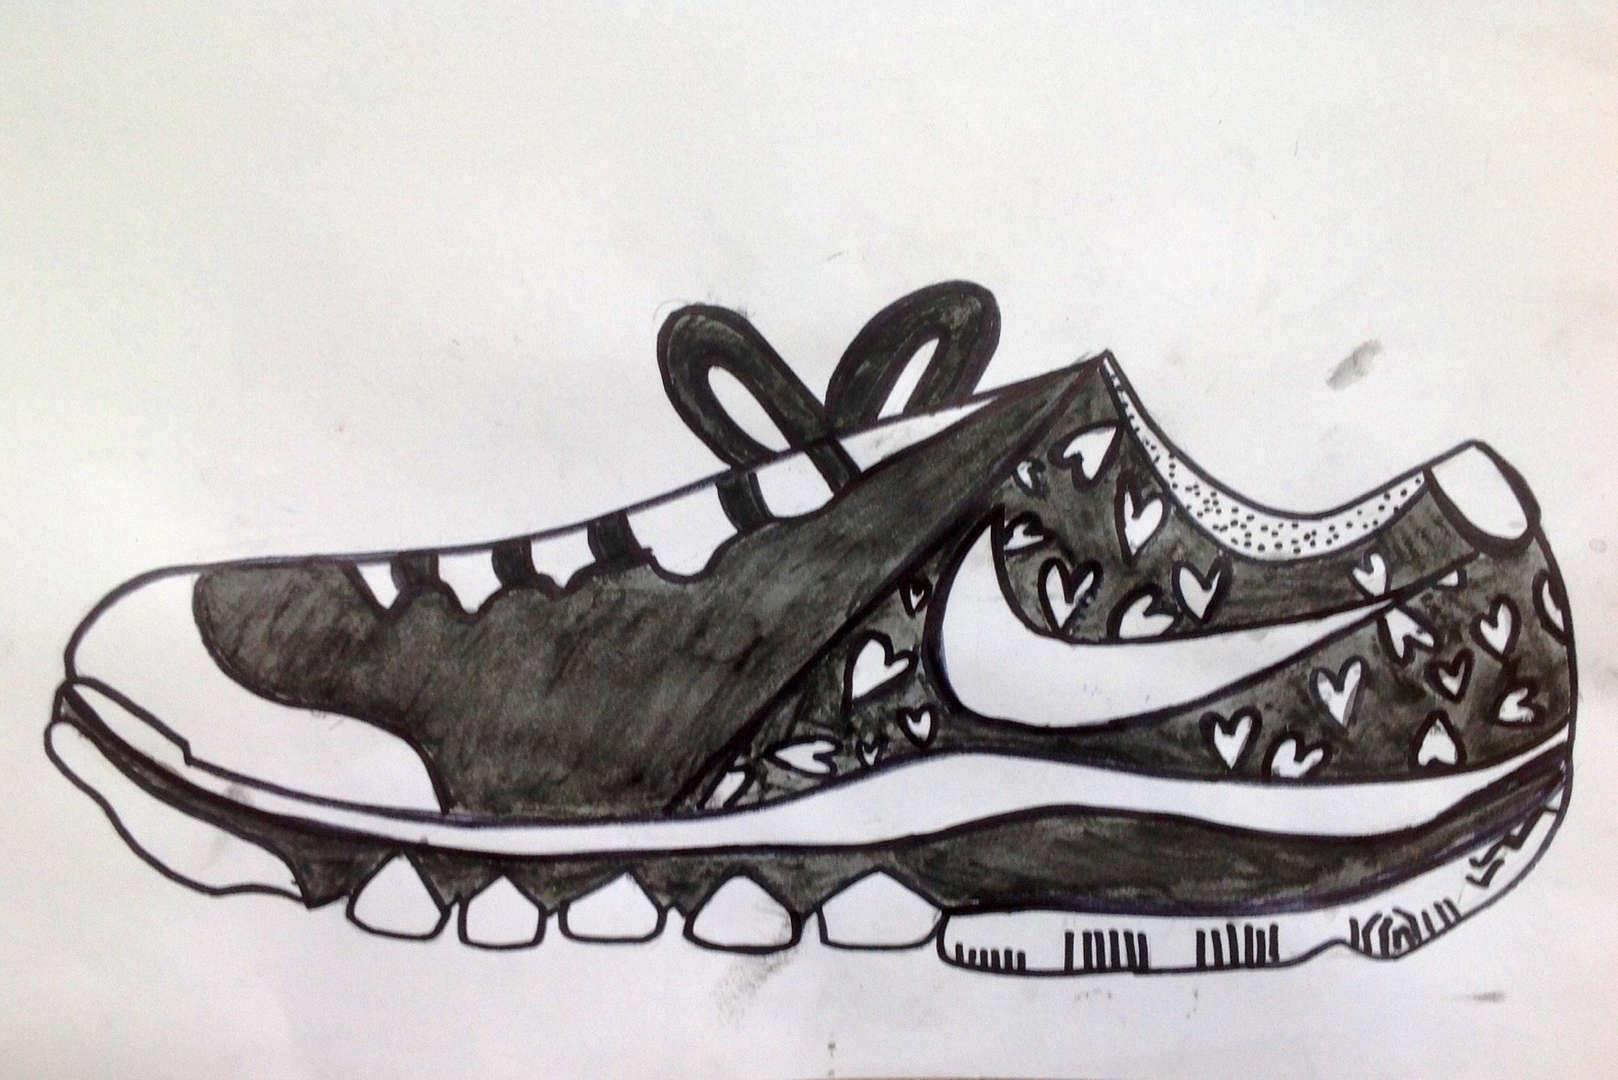 Drawing of Nikes